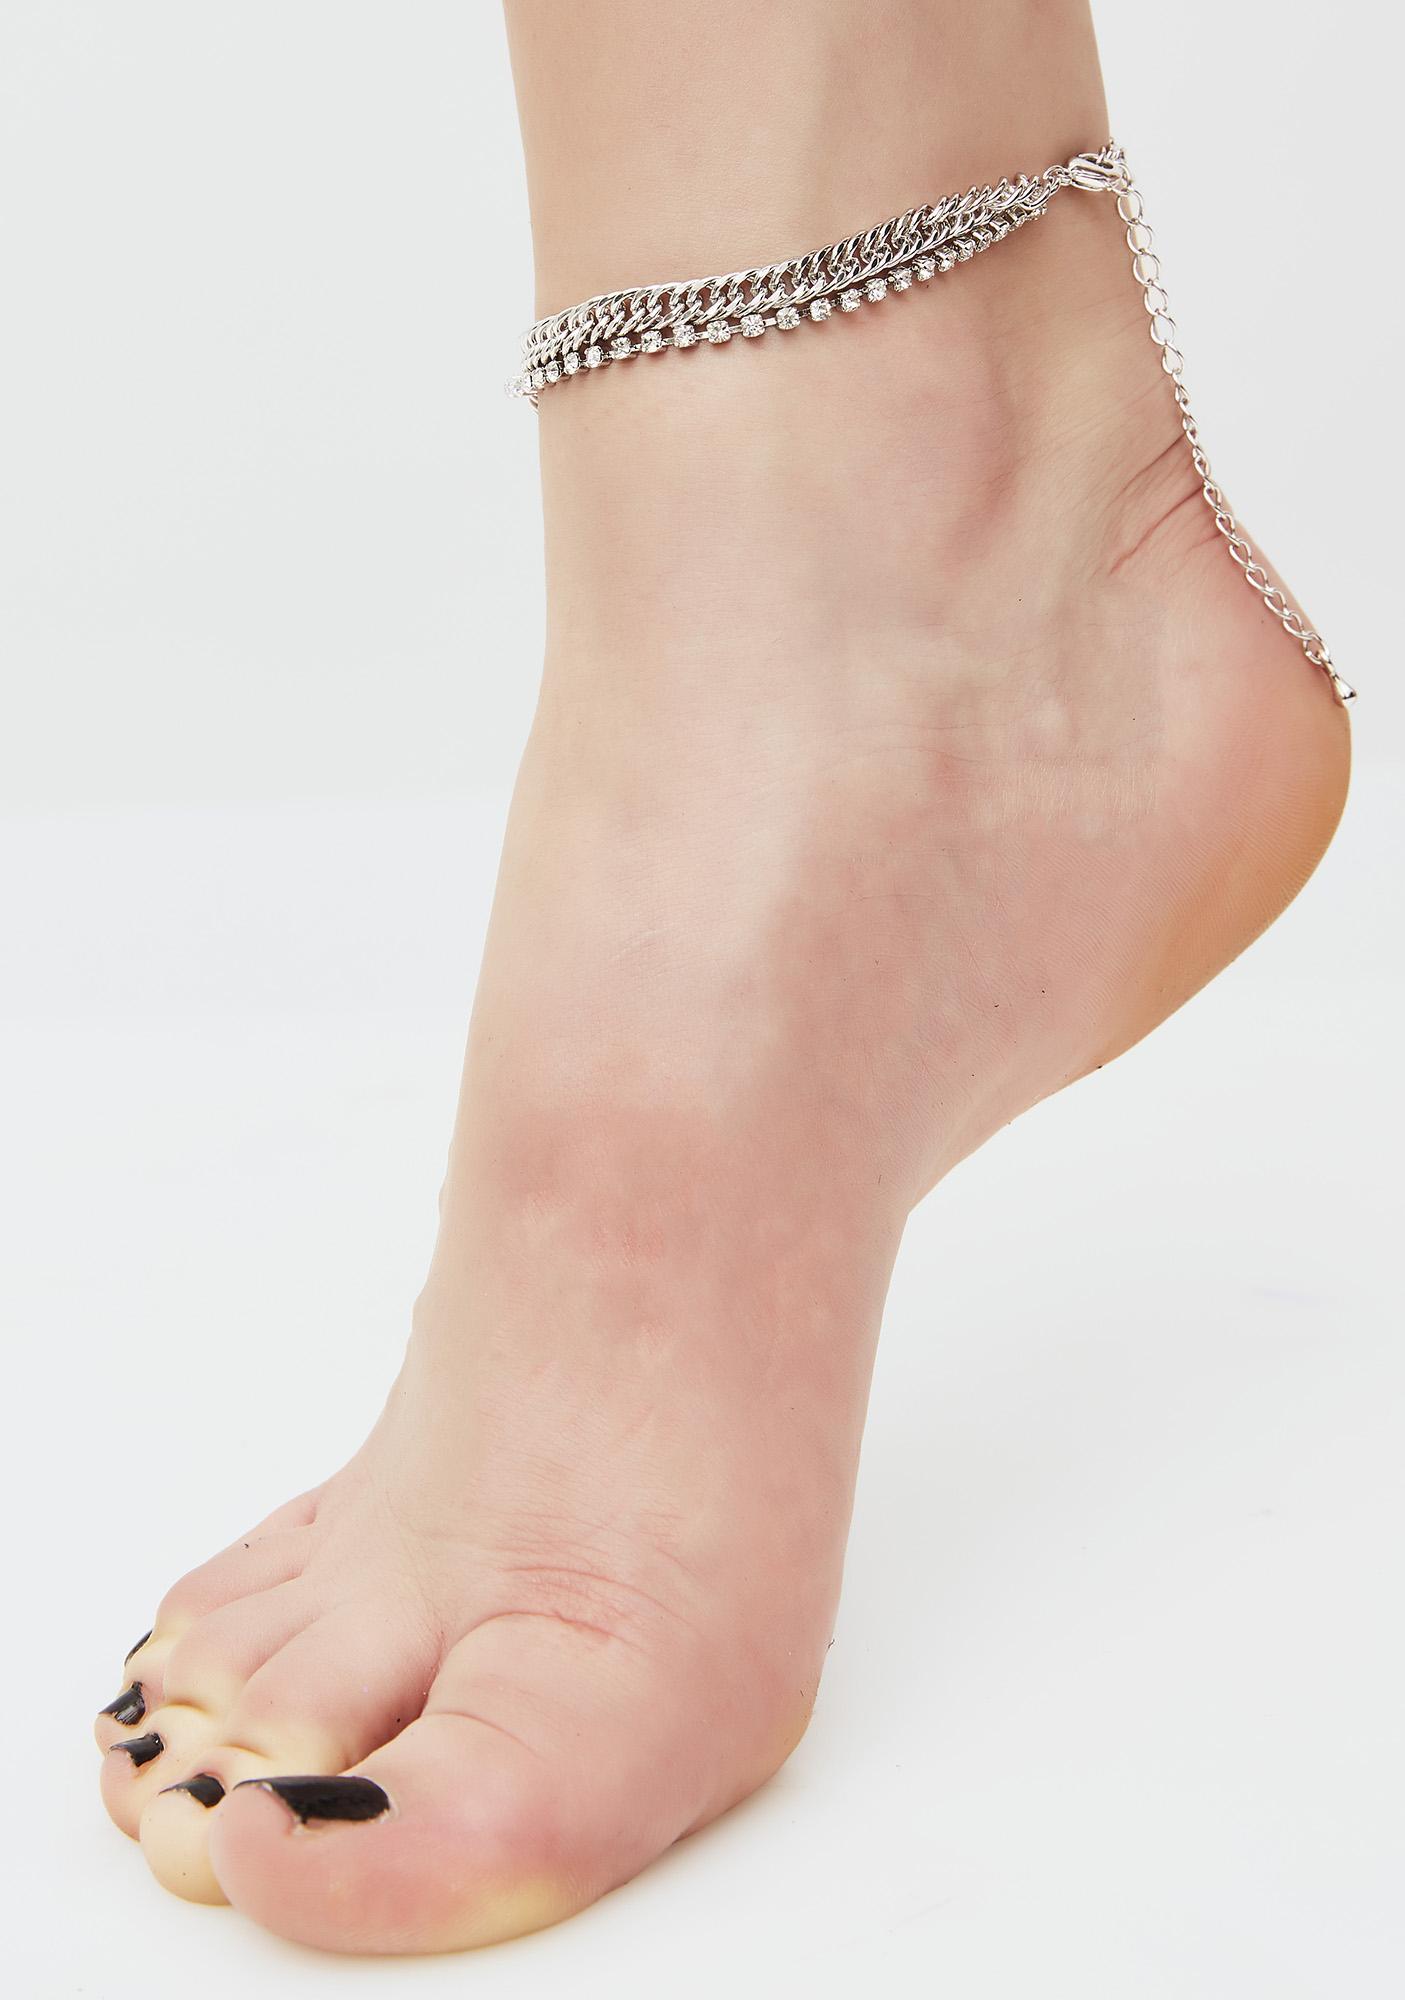 Spark Of LIght Rhinestone Chain Anklet